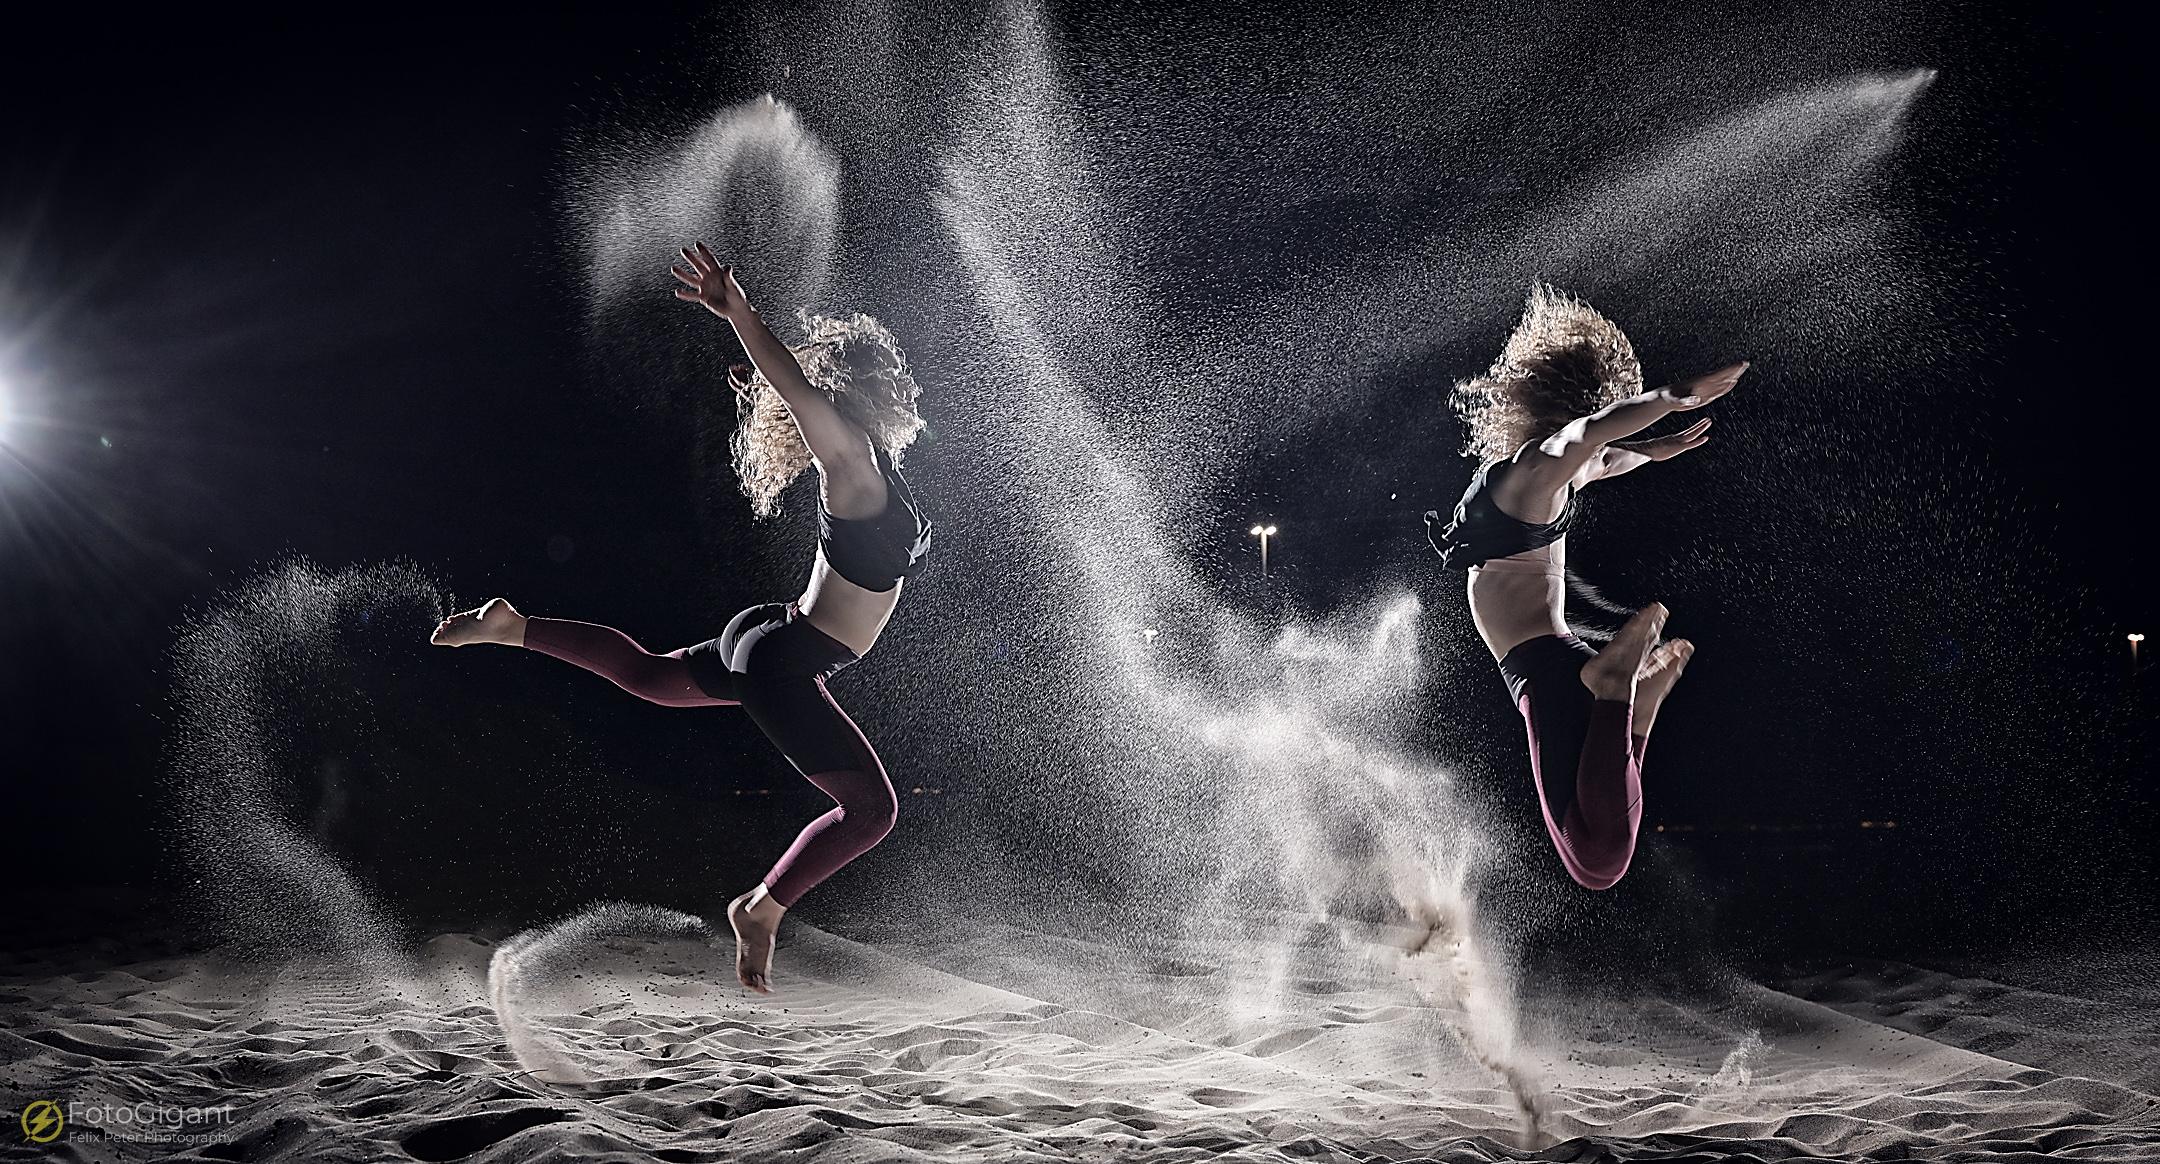 Sand-Flour-Mehl-Shooting_5.jpg